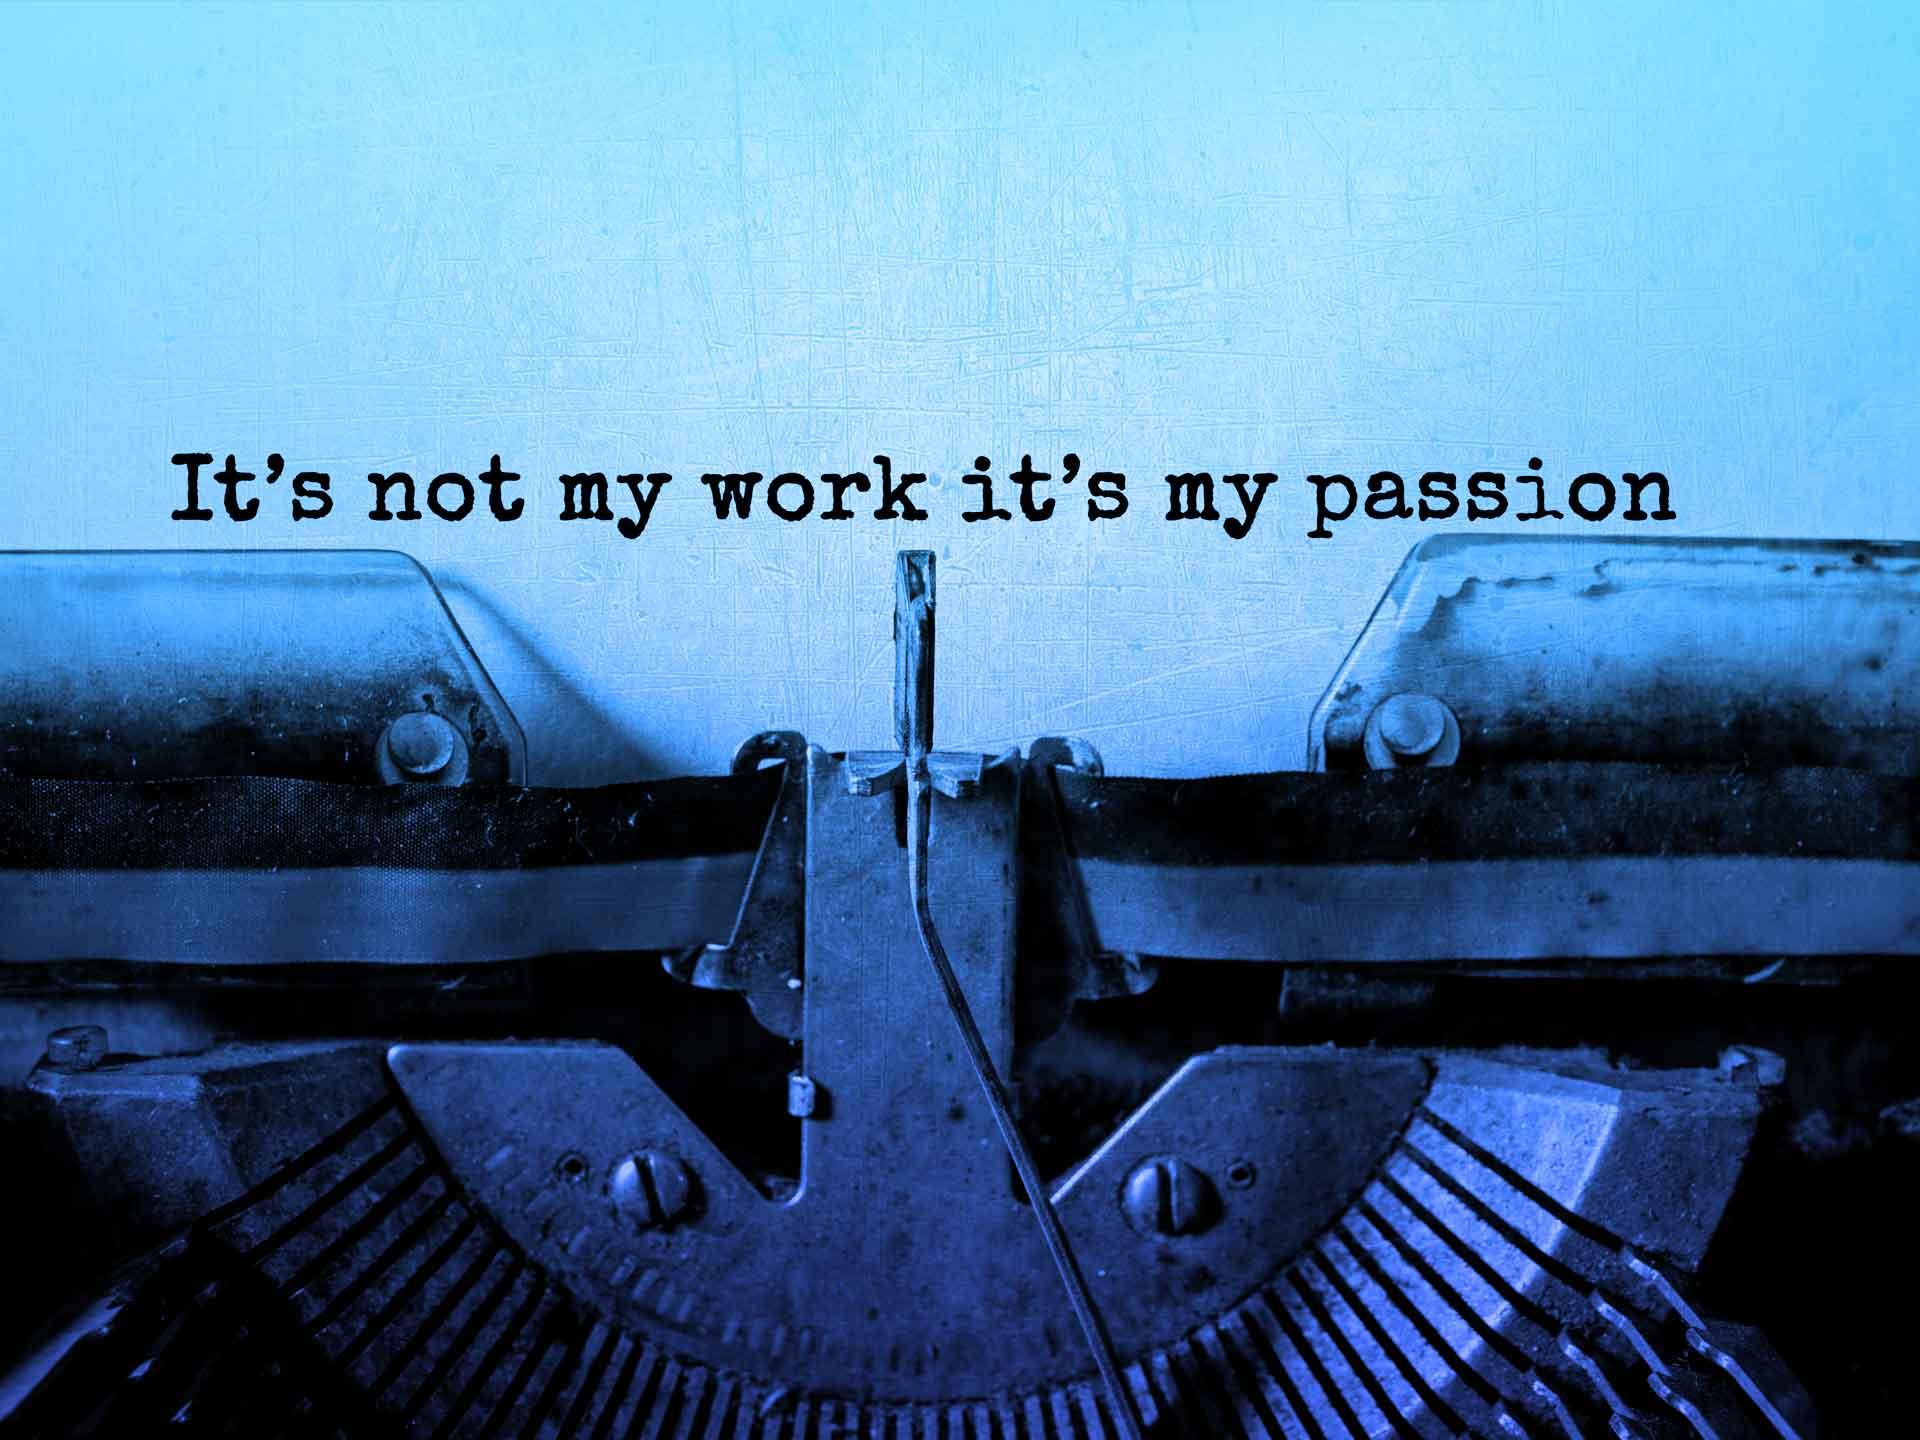 Prodware vision, our passion